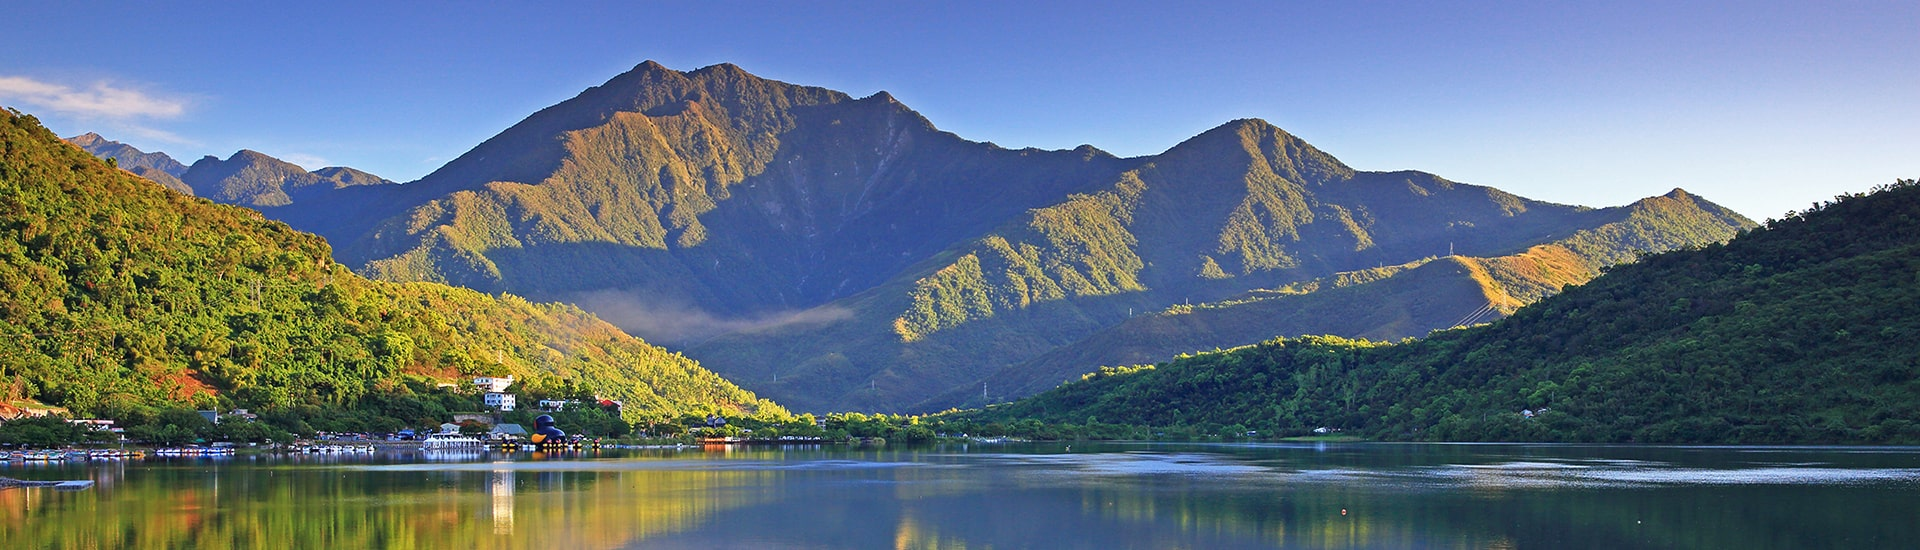 Lago de las Carpas